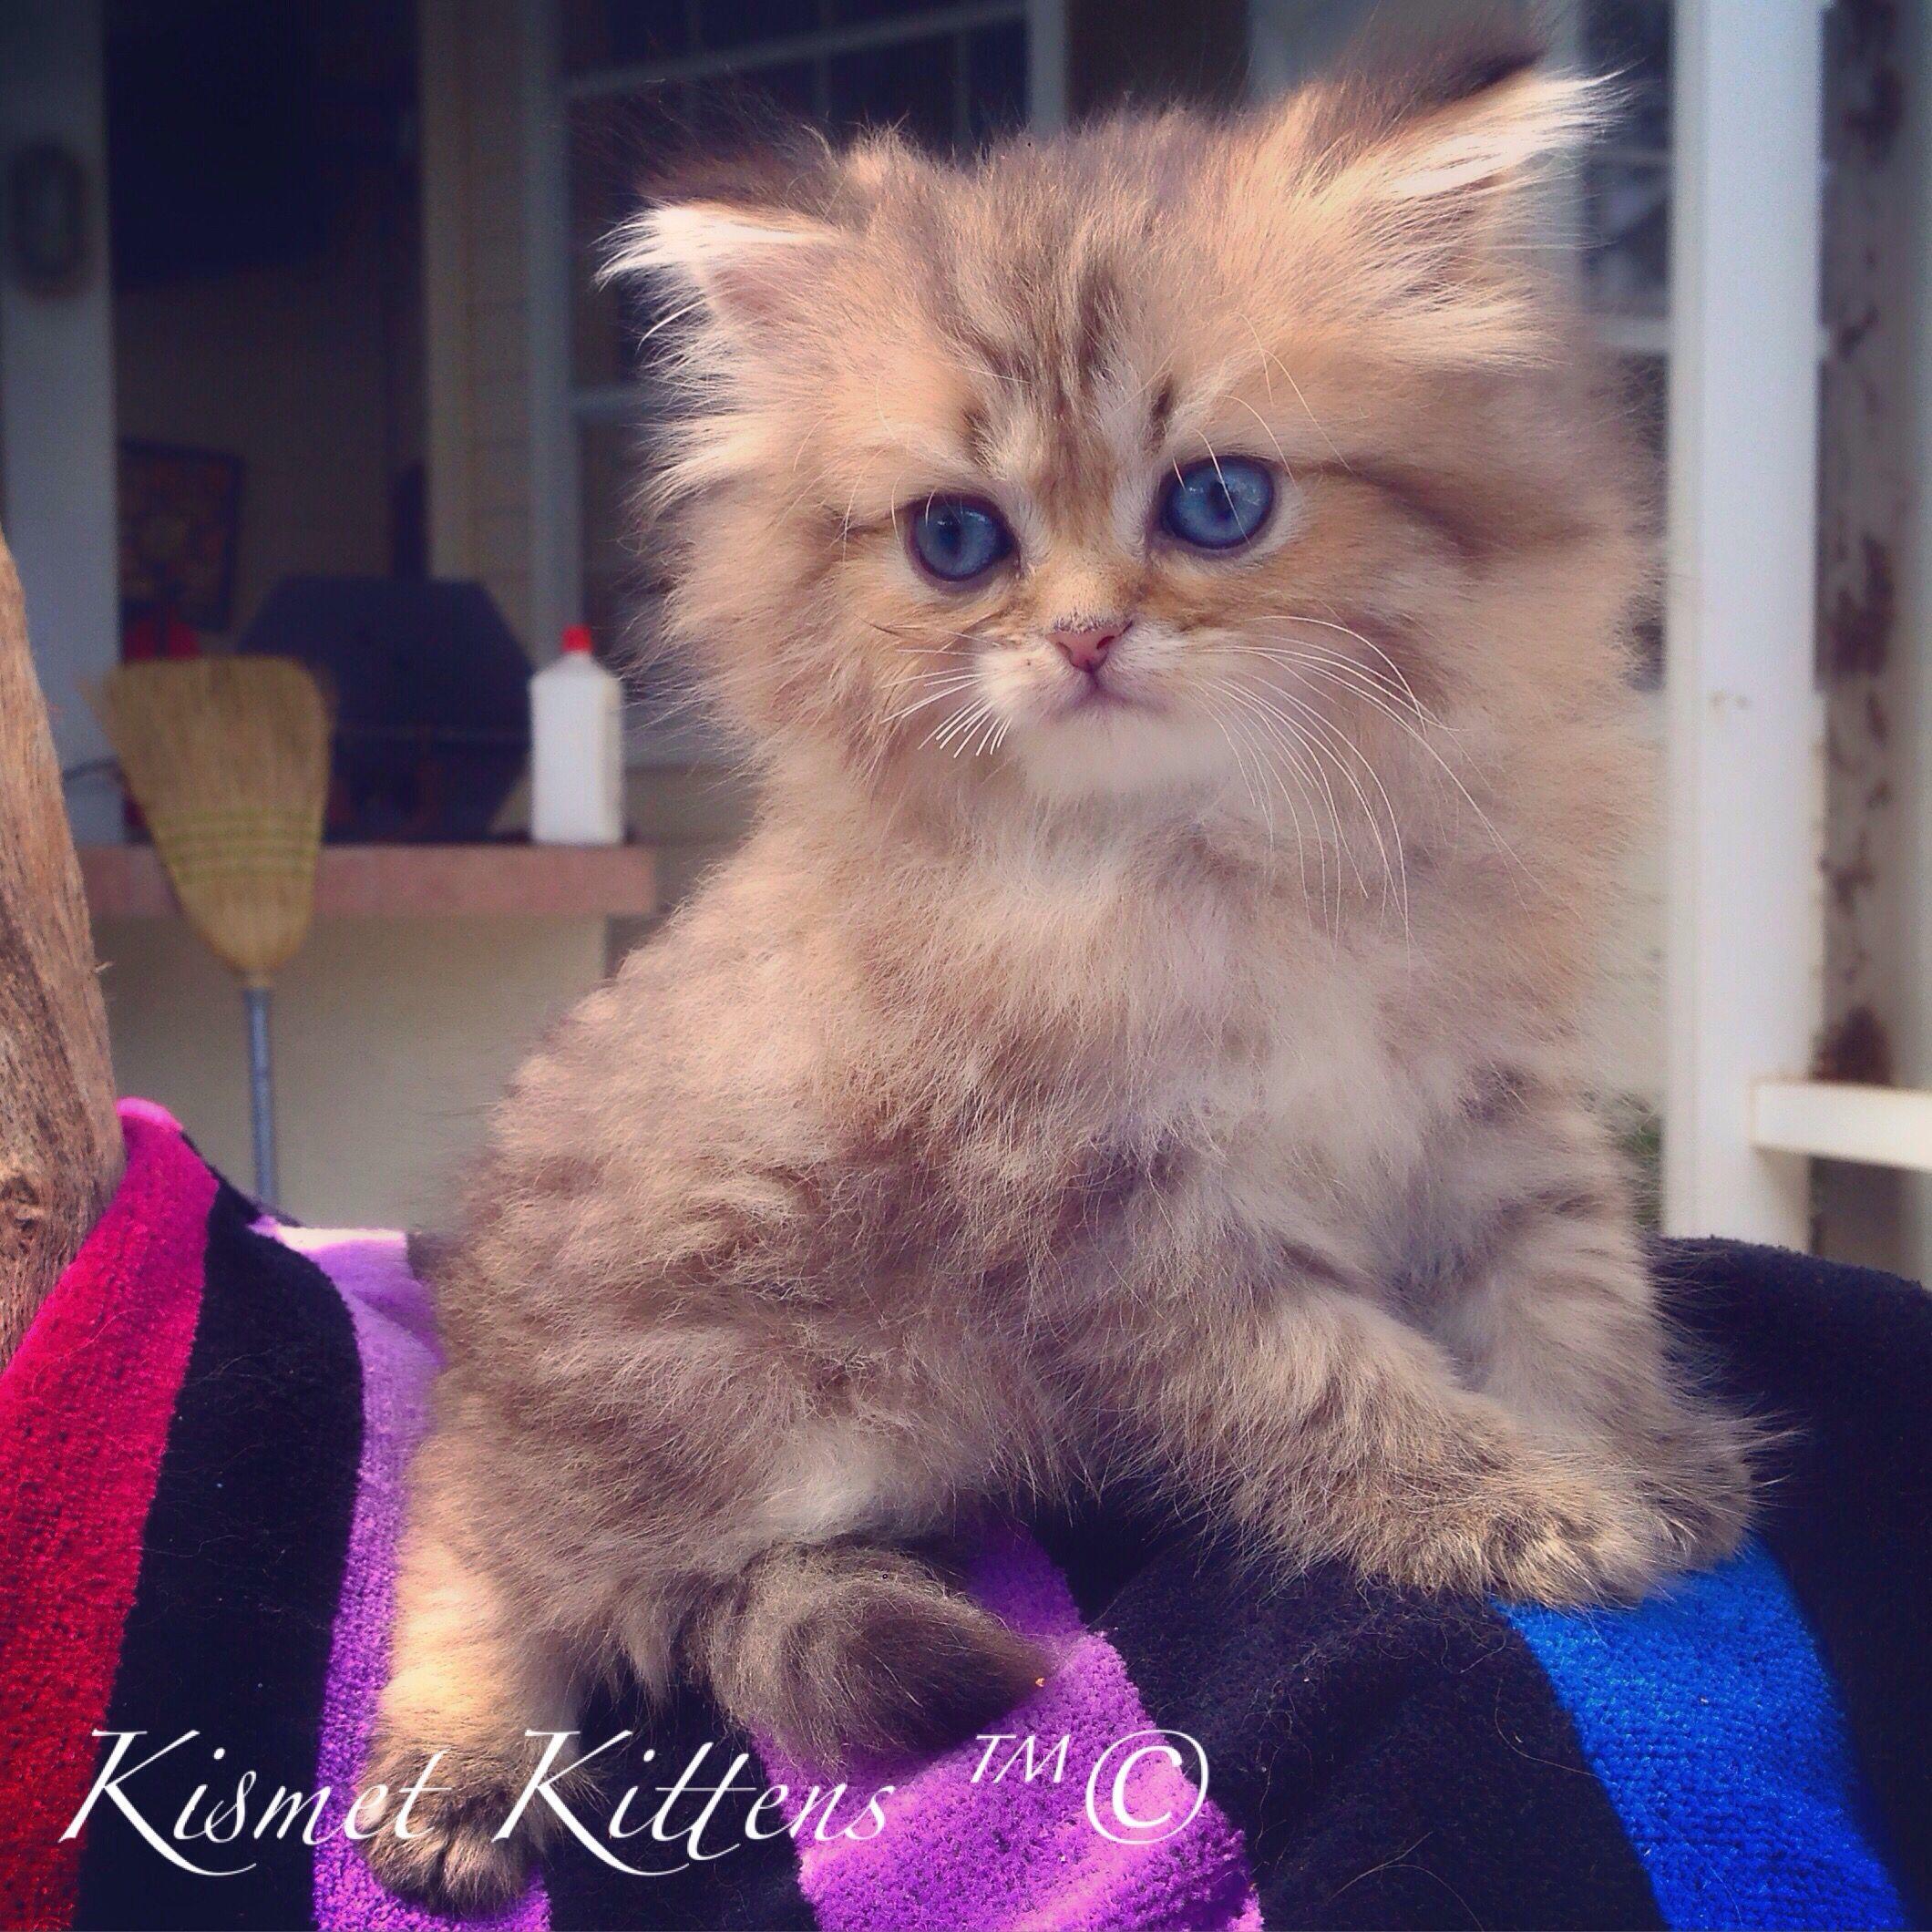 Kismet Kittens For Golden Chinchilla Shaded Doll Face Persian Kitten With Green Eyes Male Ready To Go Persian Cat Doll Face Cats And Kittens Persian Kittens